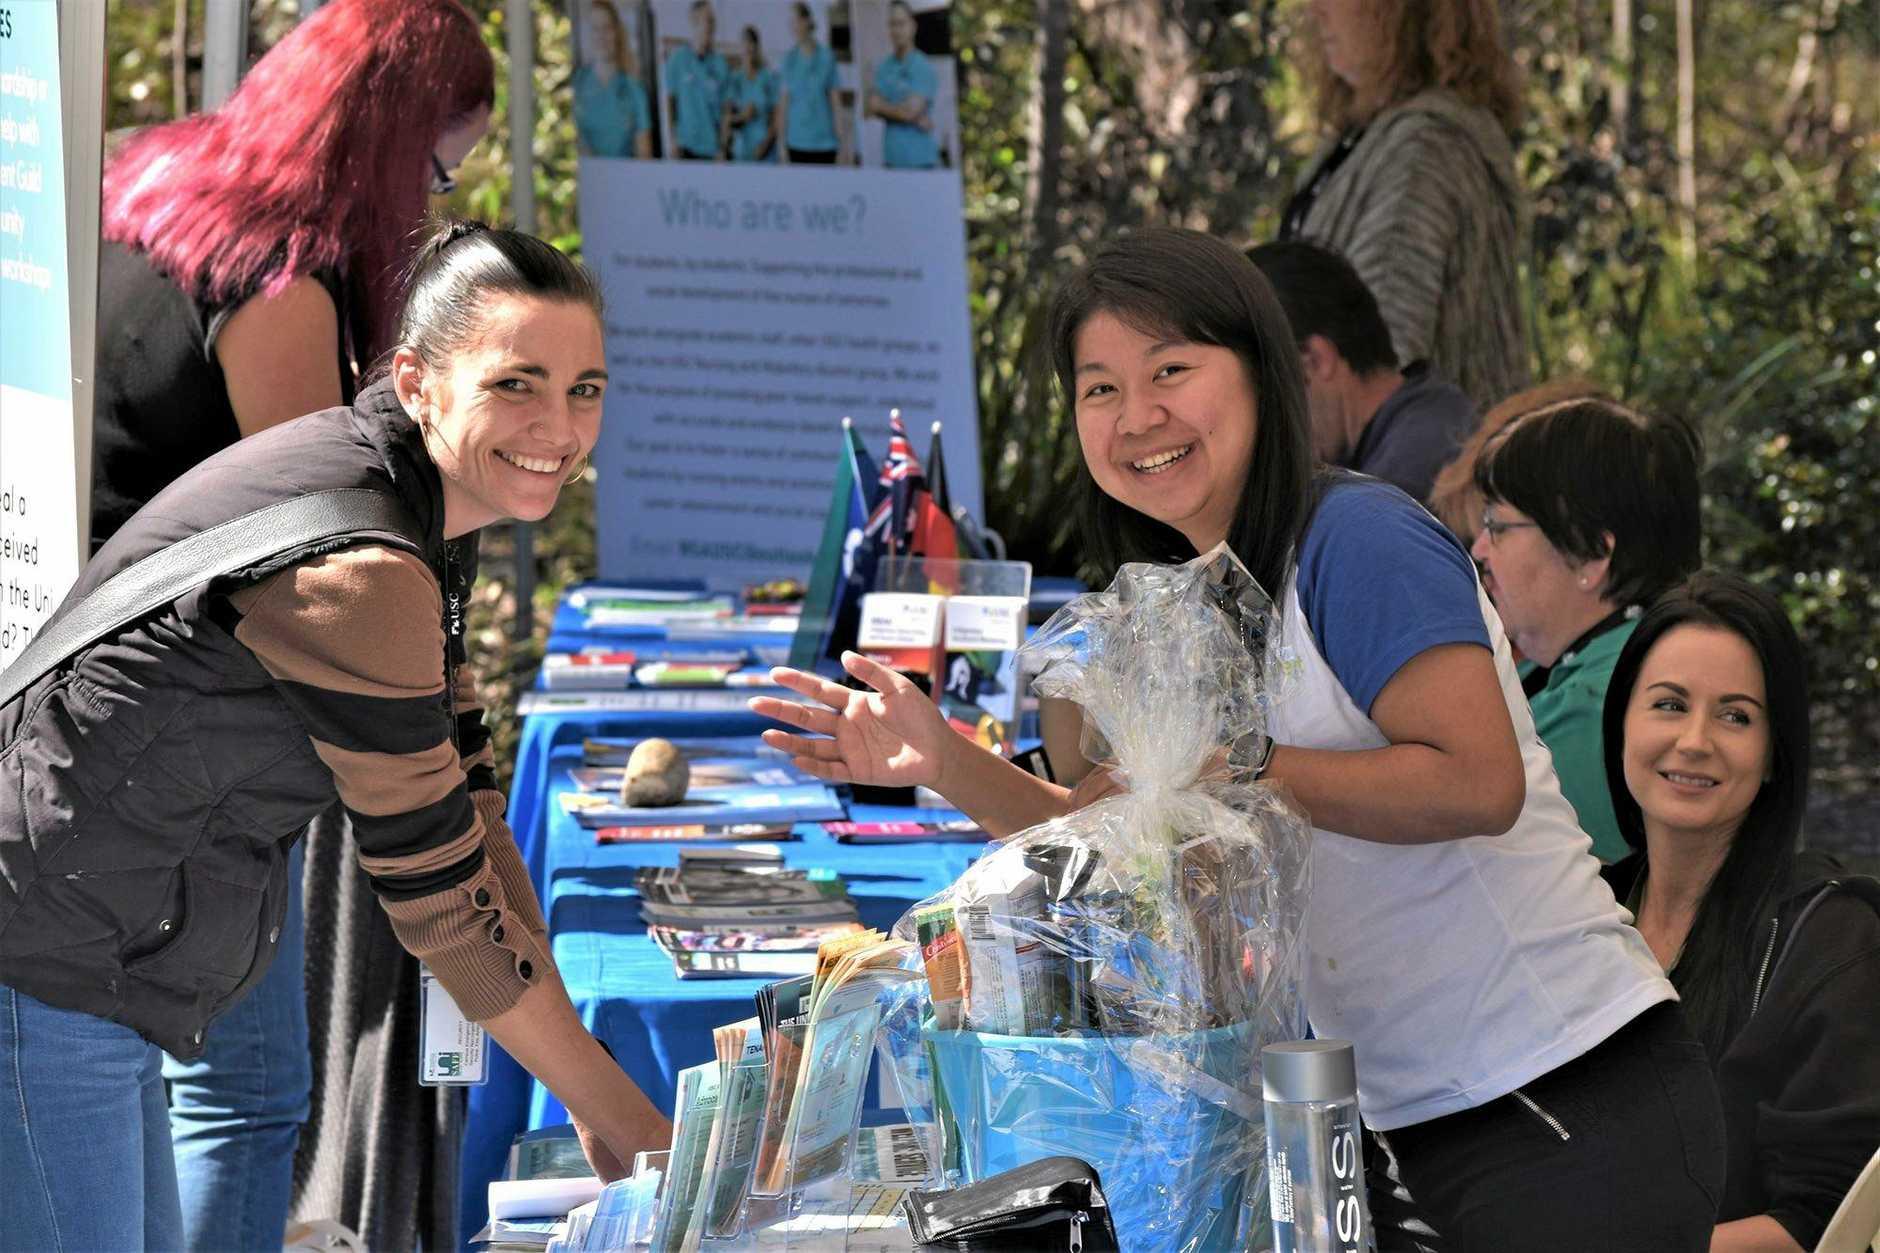 USC Open Day - Amanda Stevenson and Sally Tsai